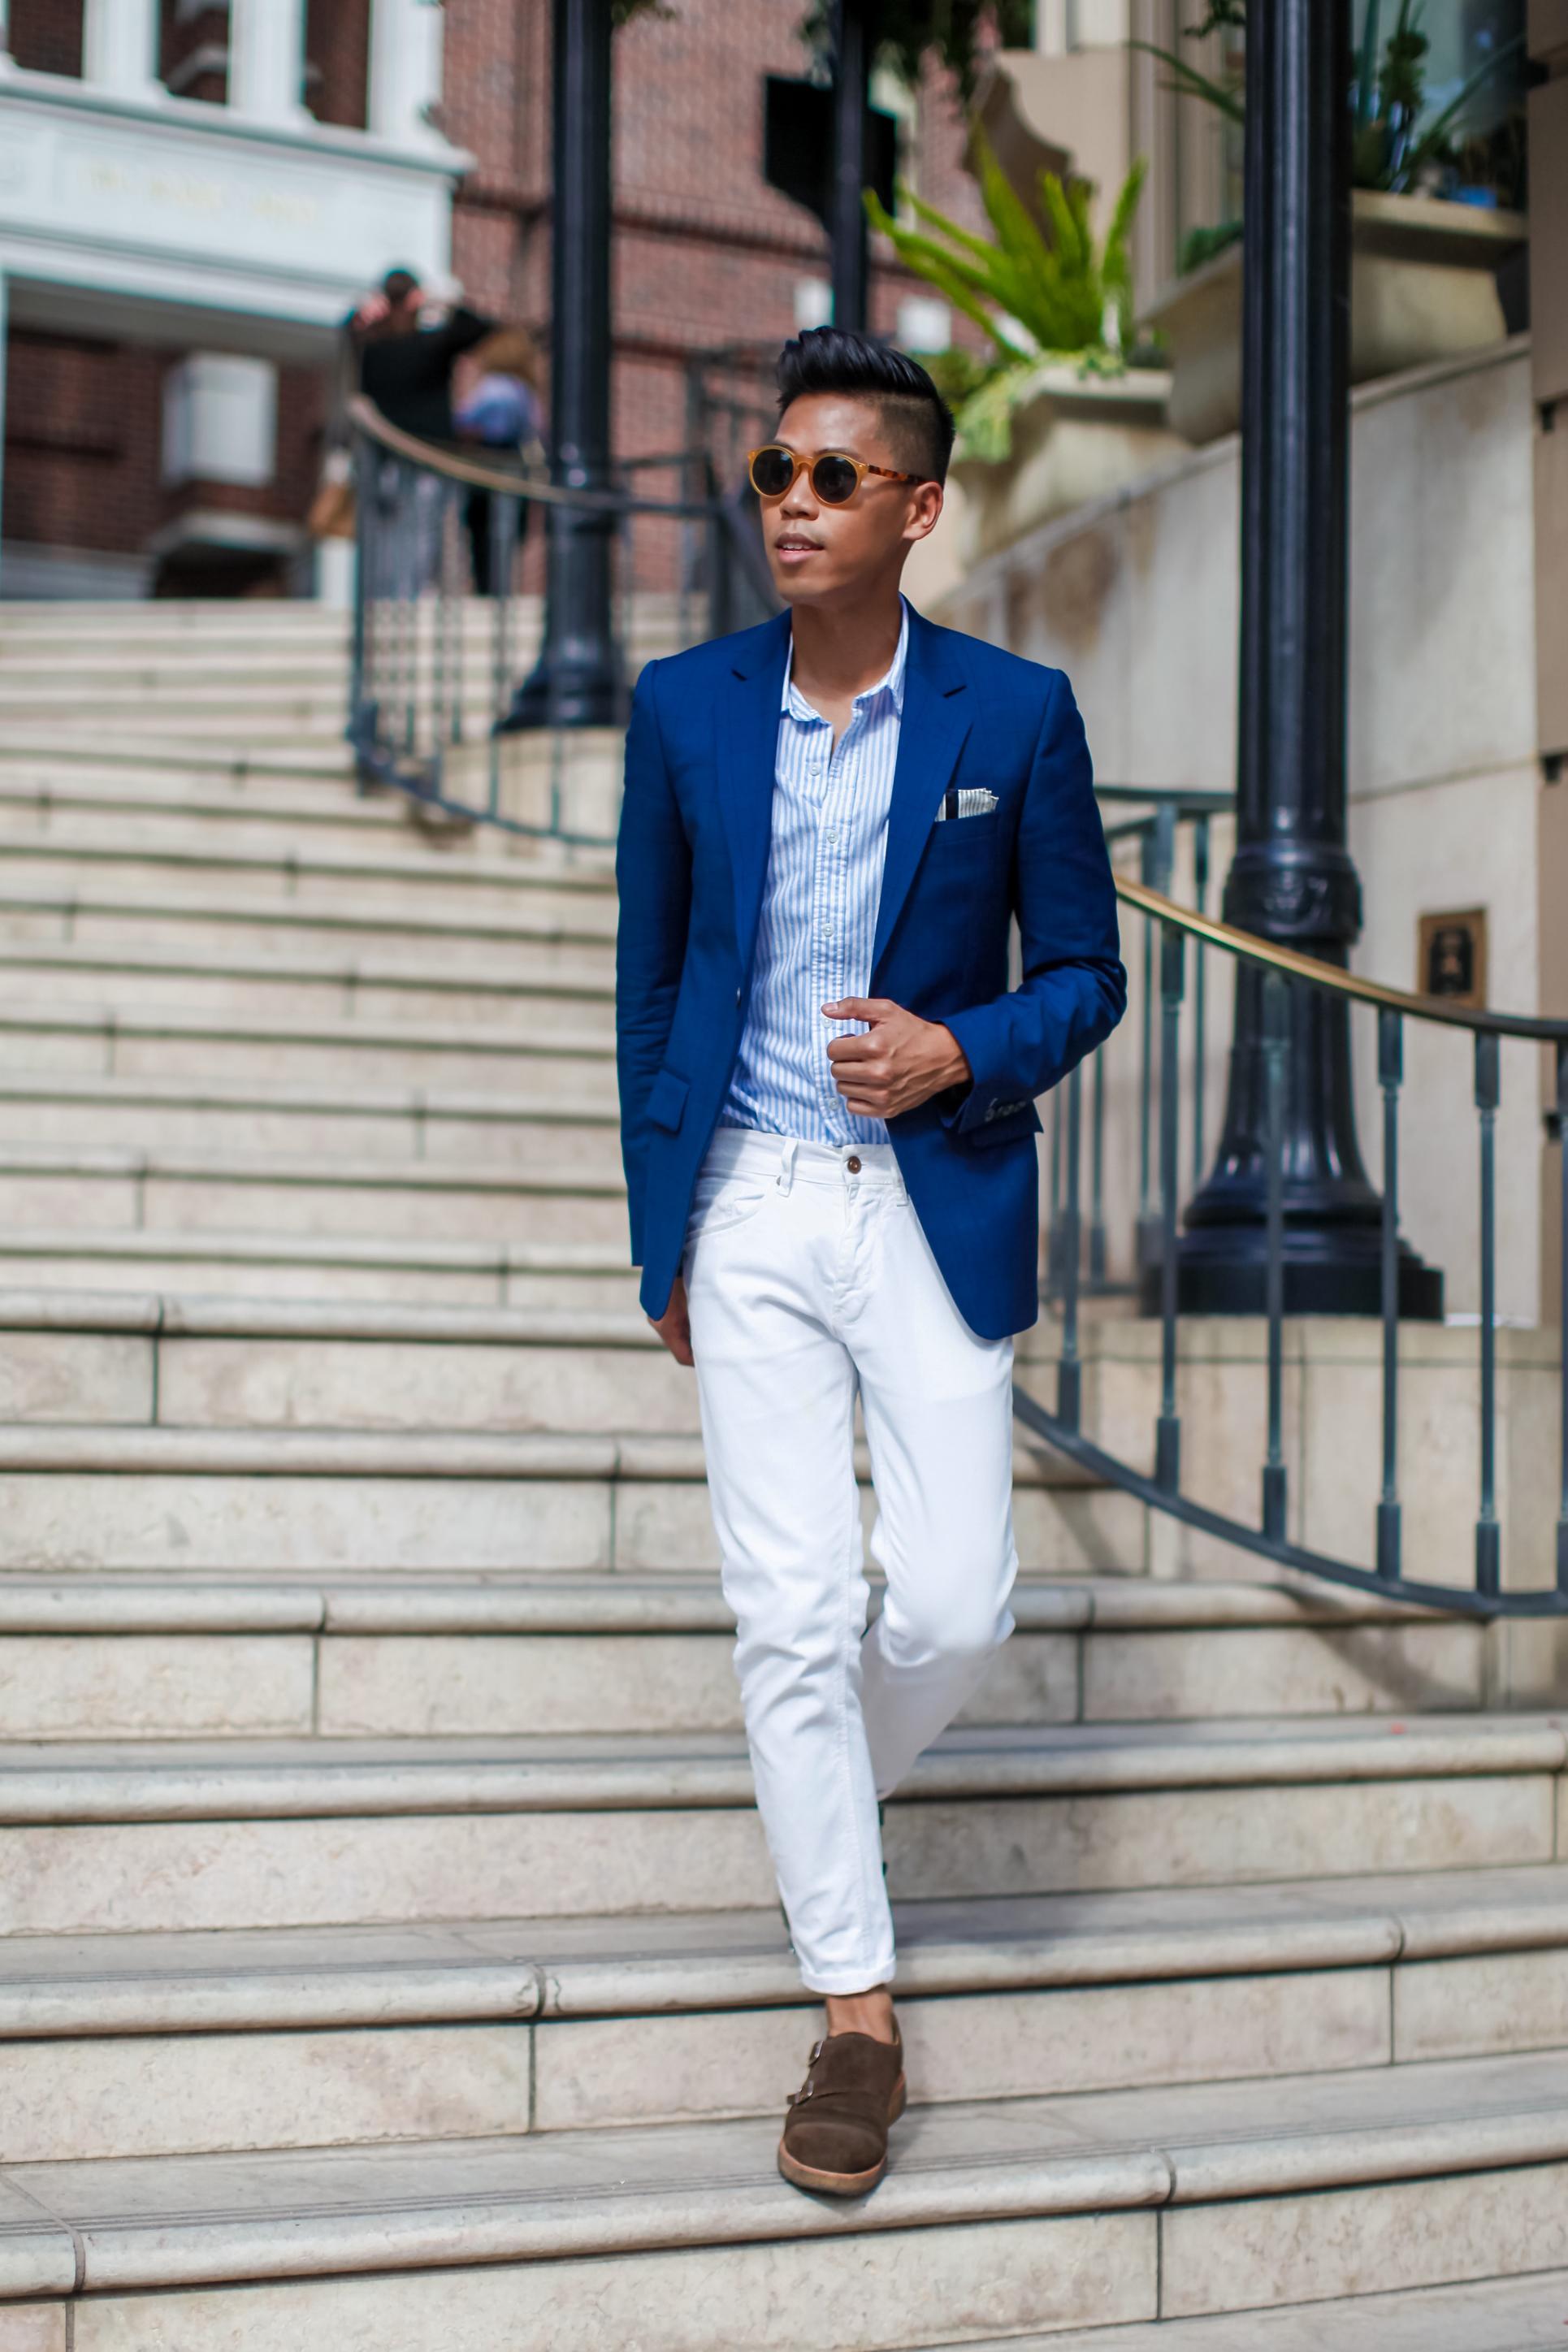 Wonderful Navy Blazer Light Blue Dress Shirt And Navy Tie With White Slacks